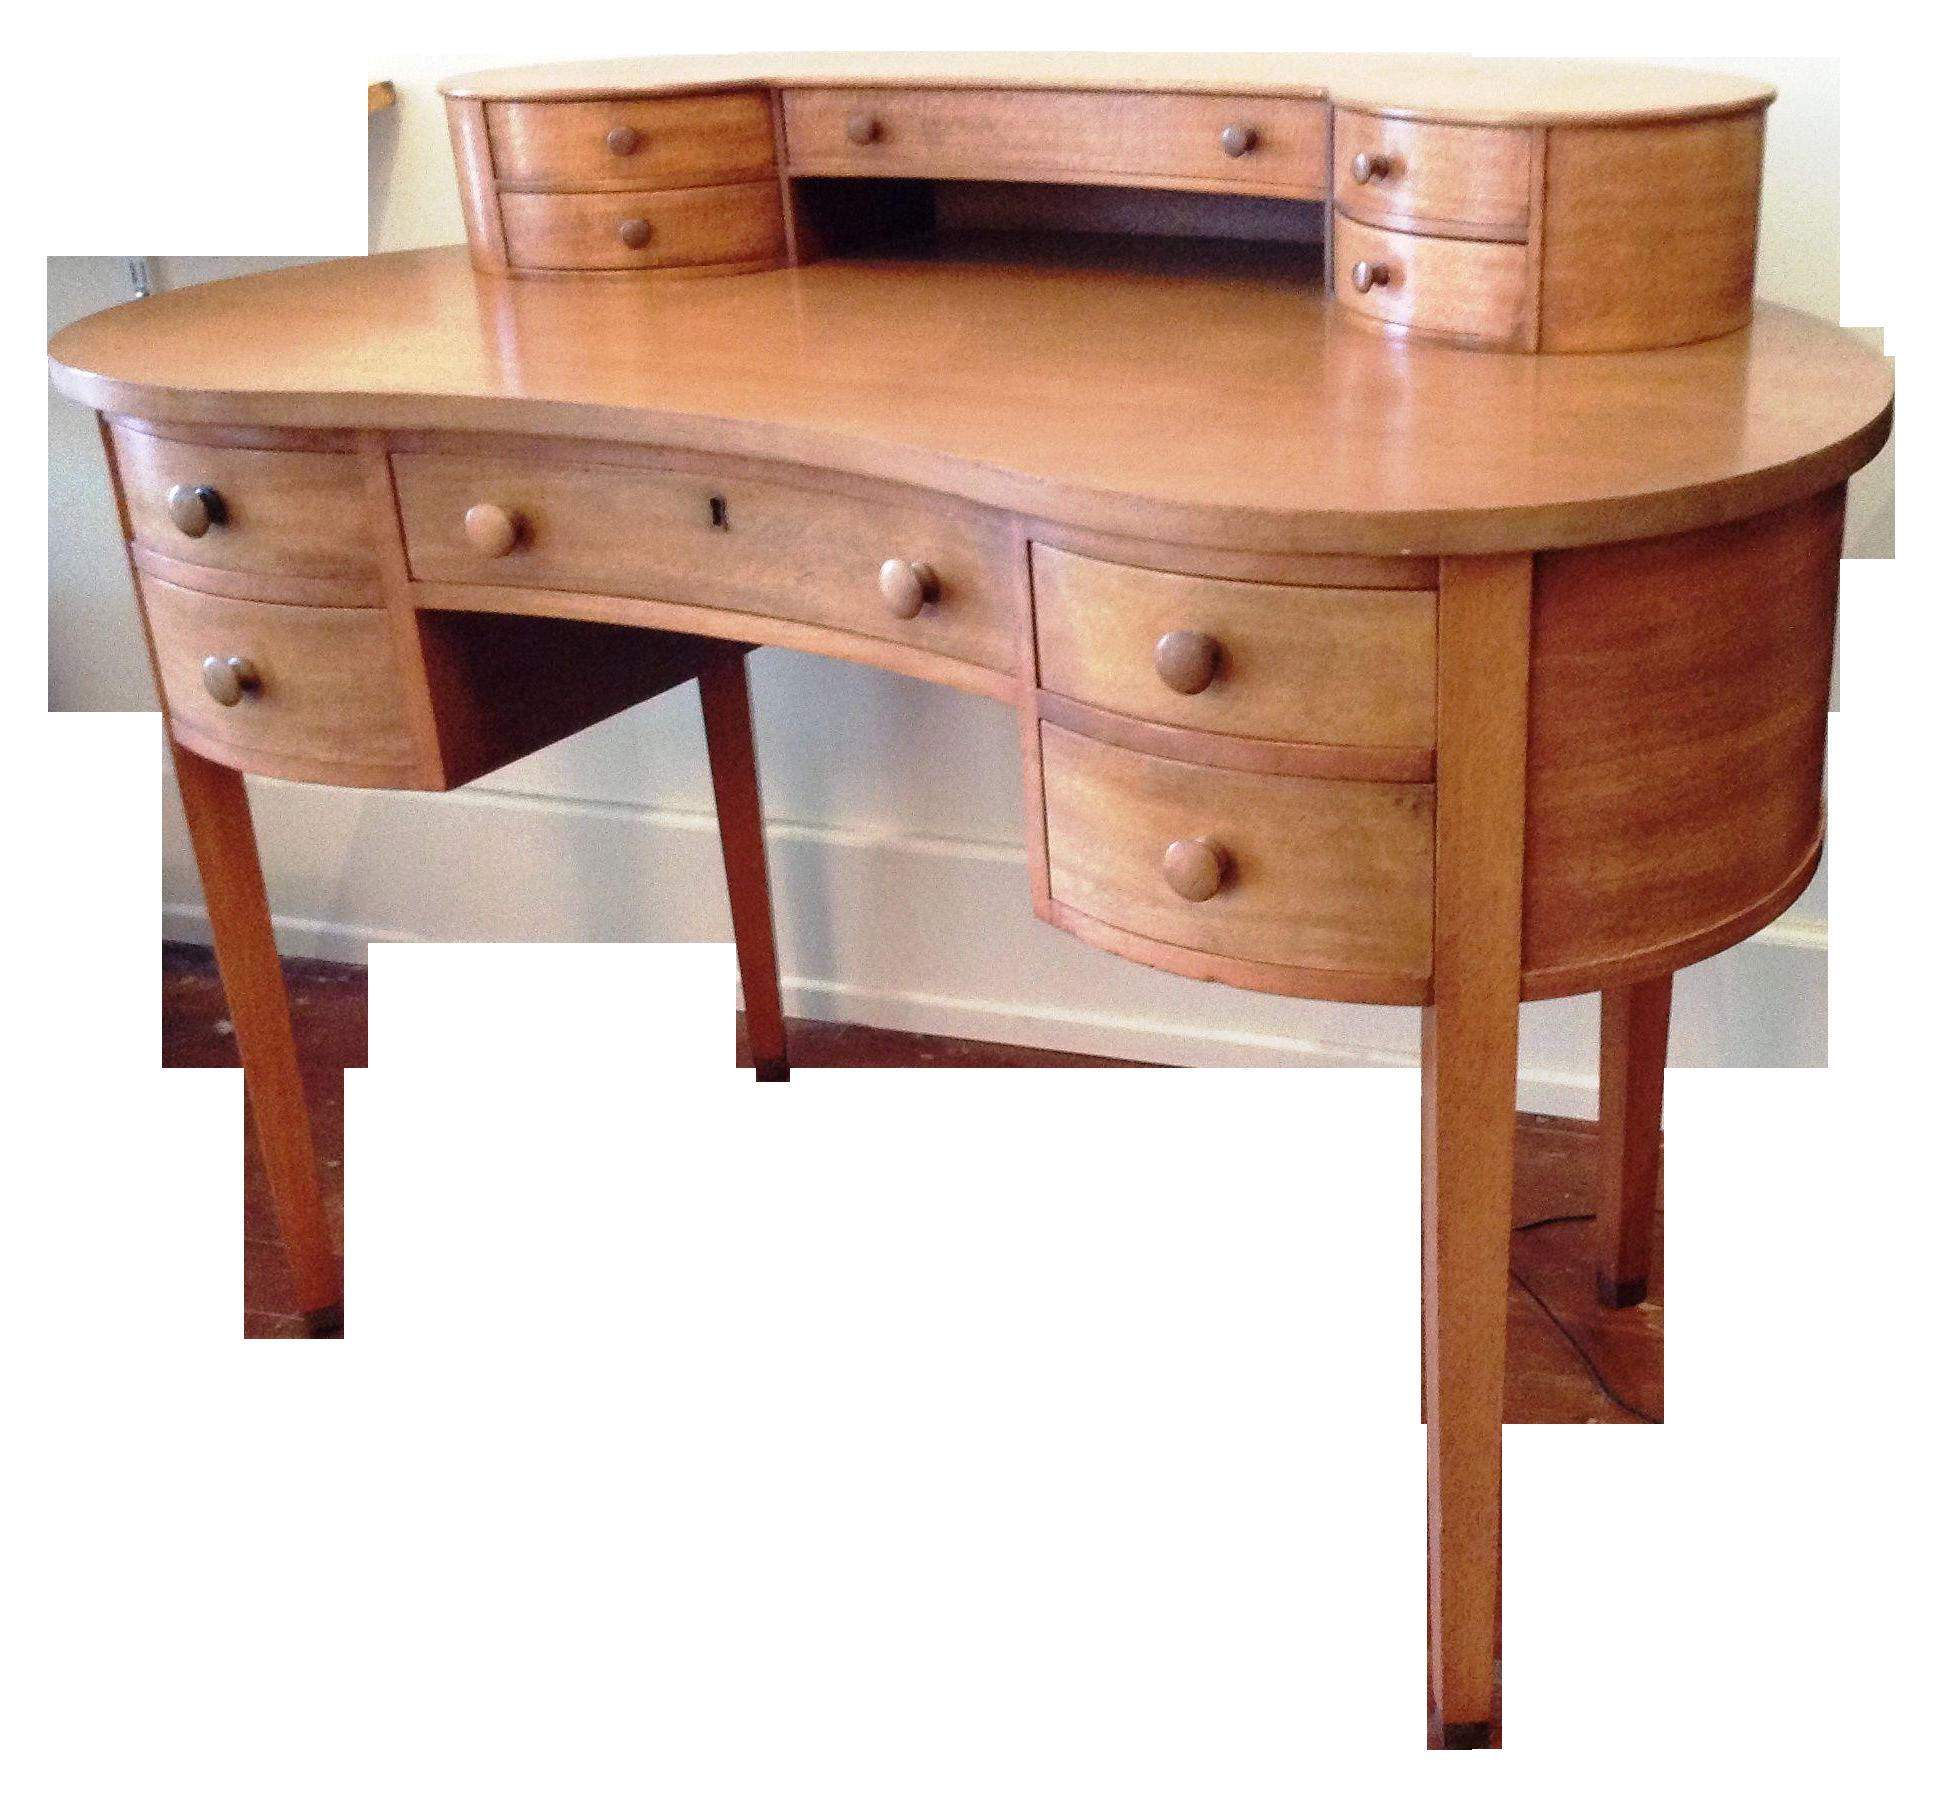 Mahogany Kidney Shaped Desk 2200 On Chairish Com Kidney Shaped